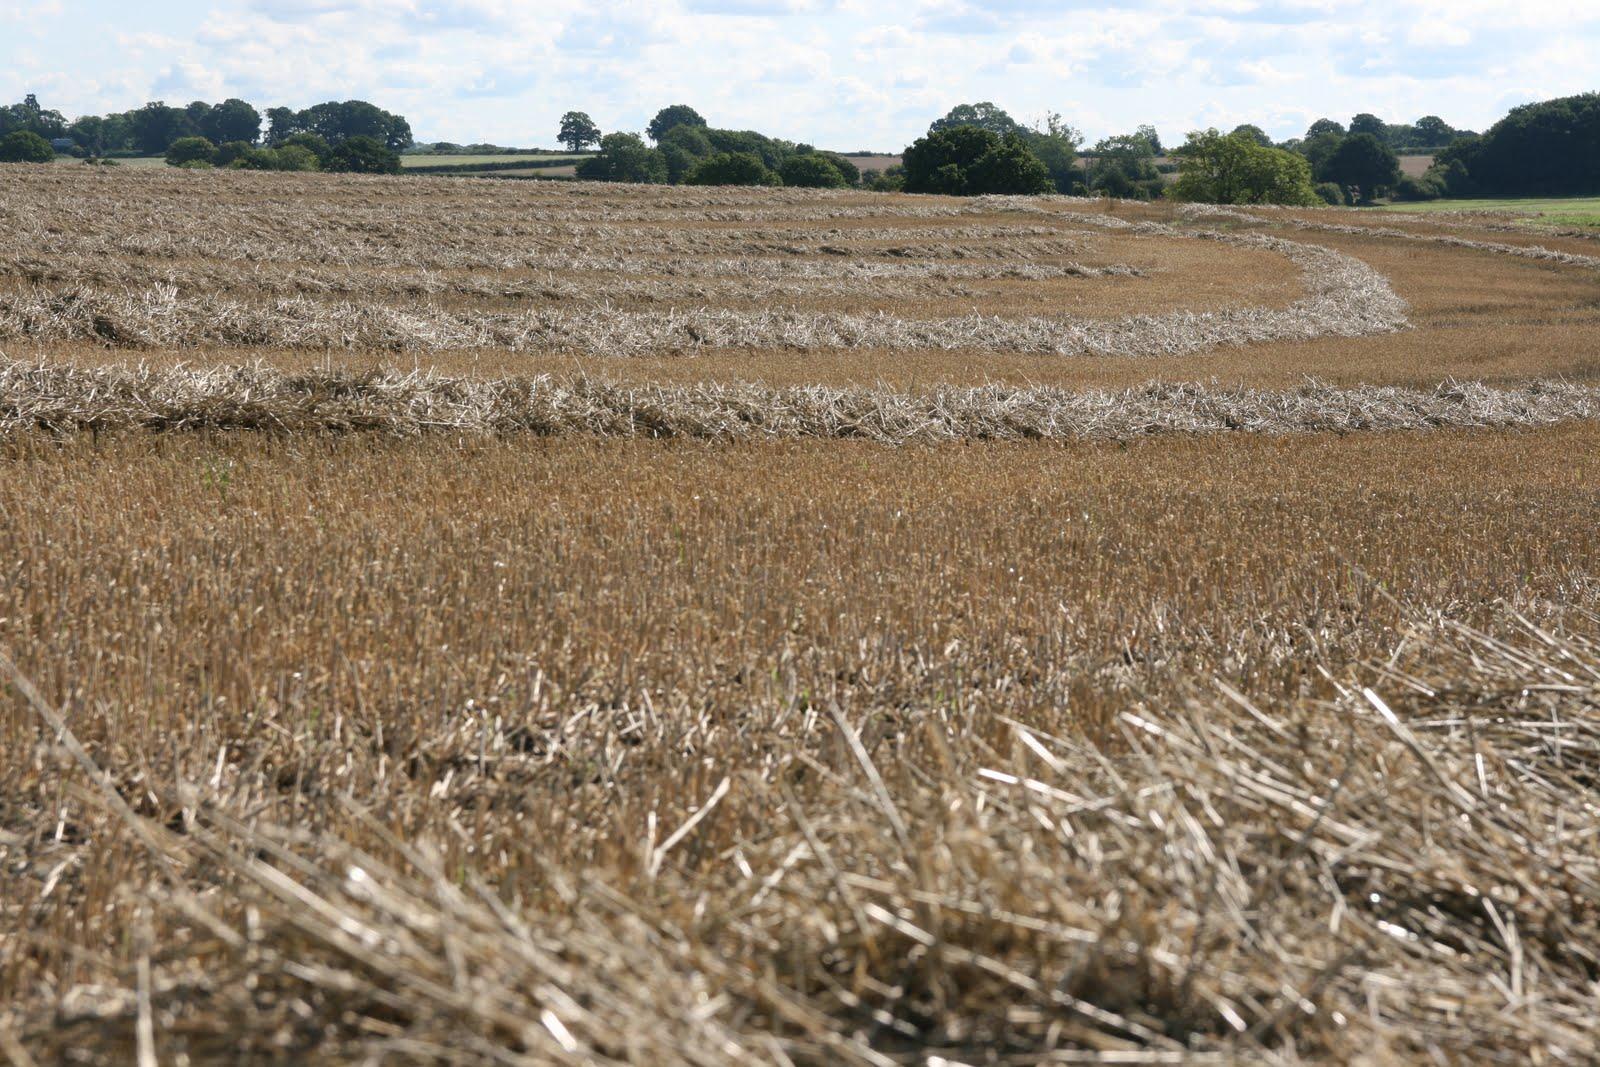 1008 069 Alton Circular, Hampshire, England After the harvest